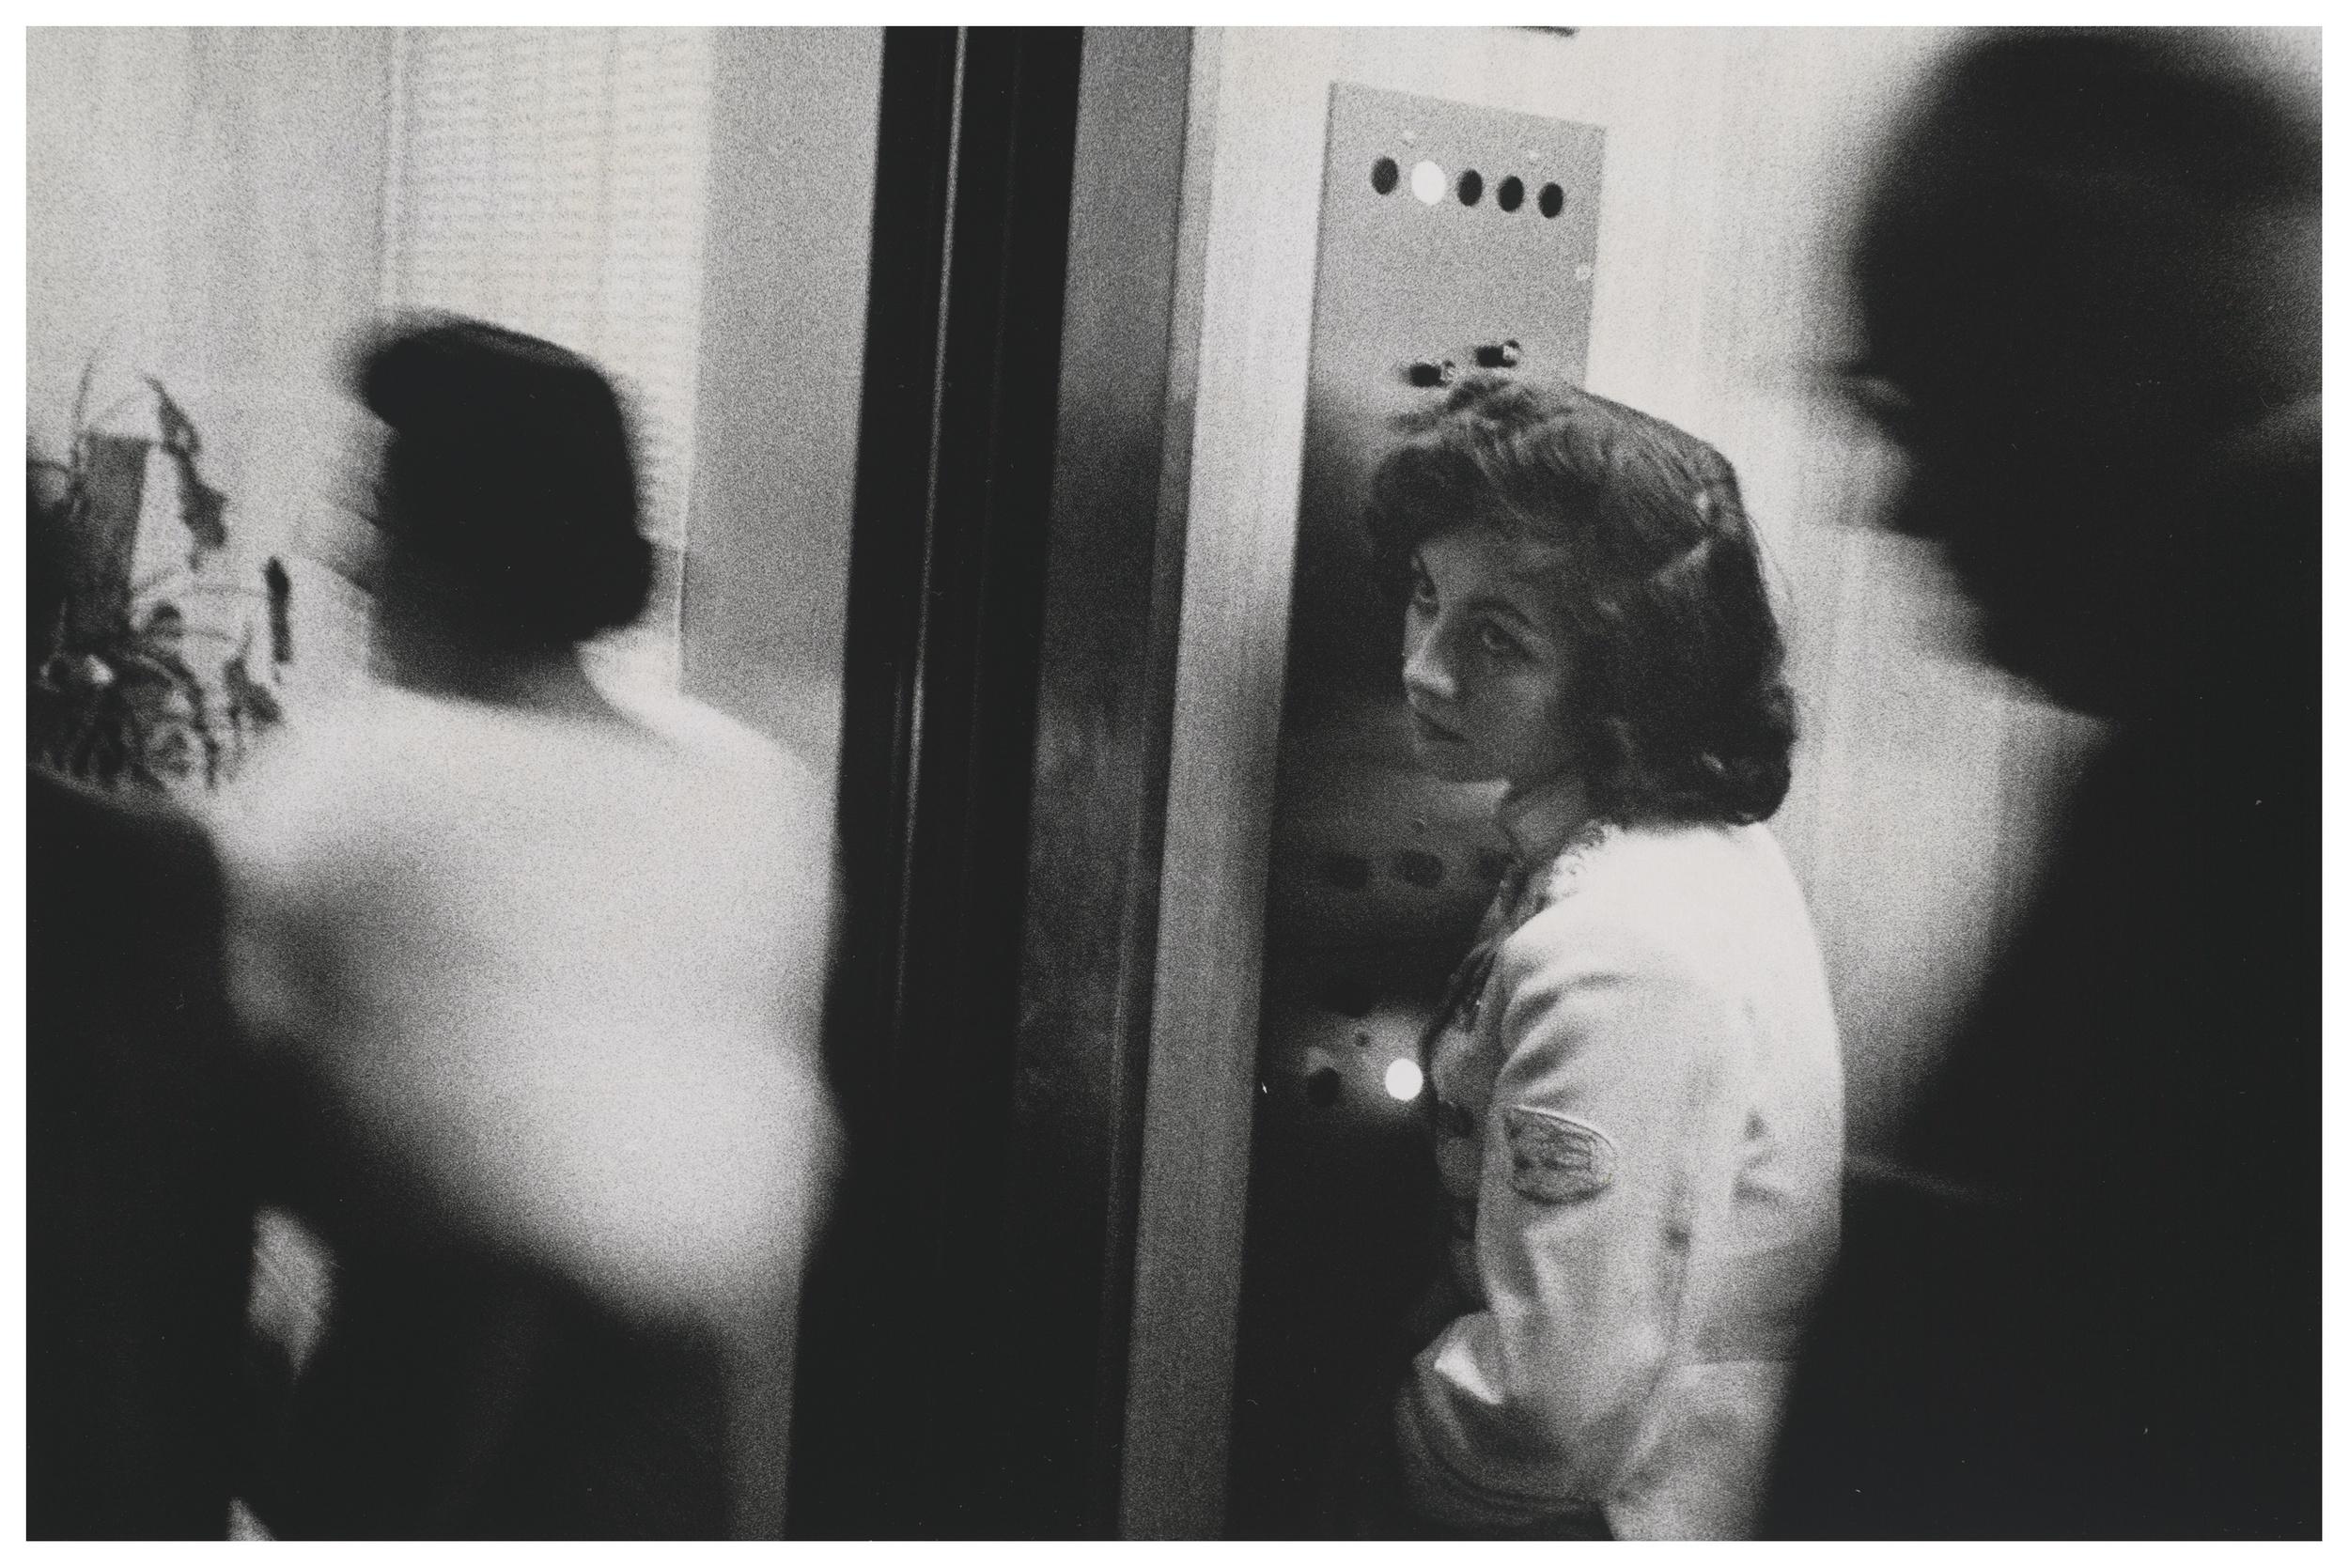 Photo by Robert Frank, 1959